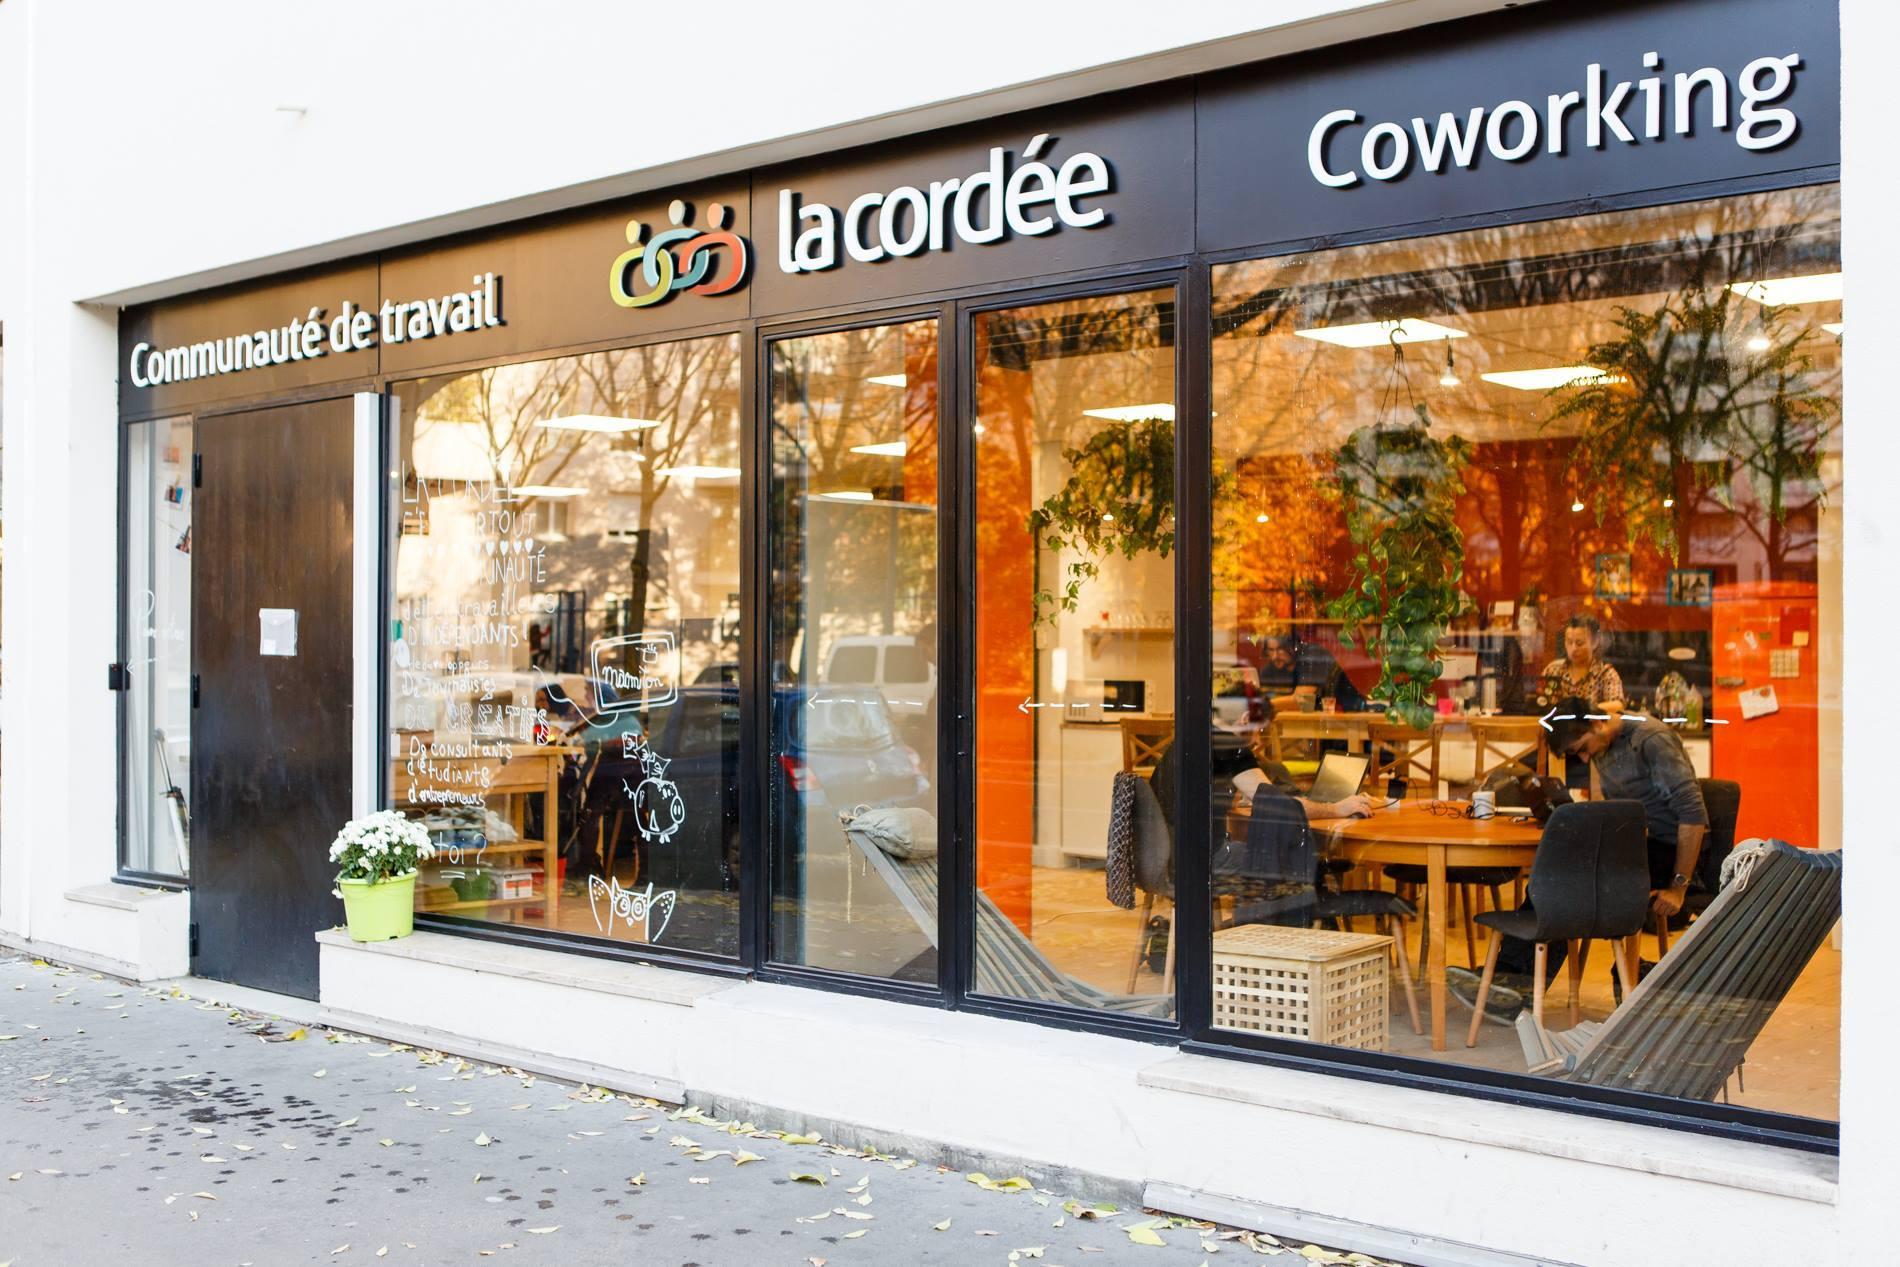 La Cordée Coworking - Annecy, Annecy